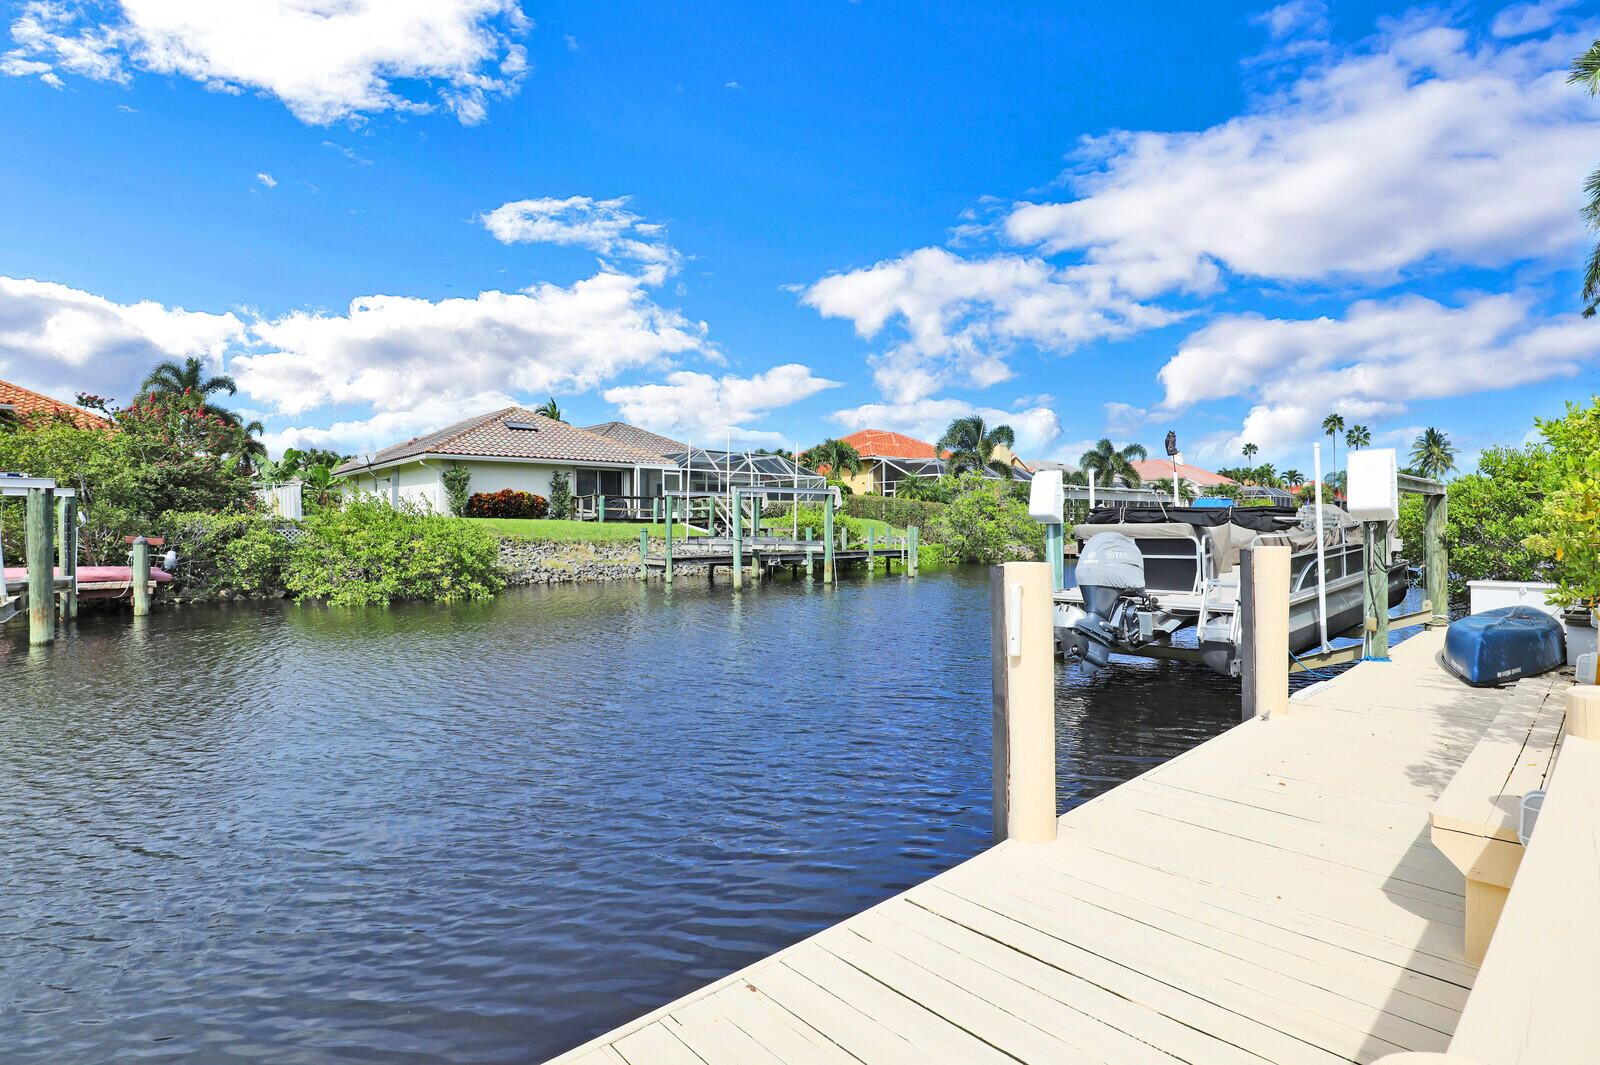 Photo of 8806 SE Riverfront Terrace, Tequesta, FL 33469 (MLS # RX-10745894)